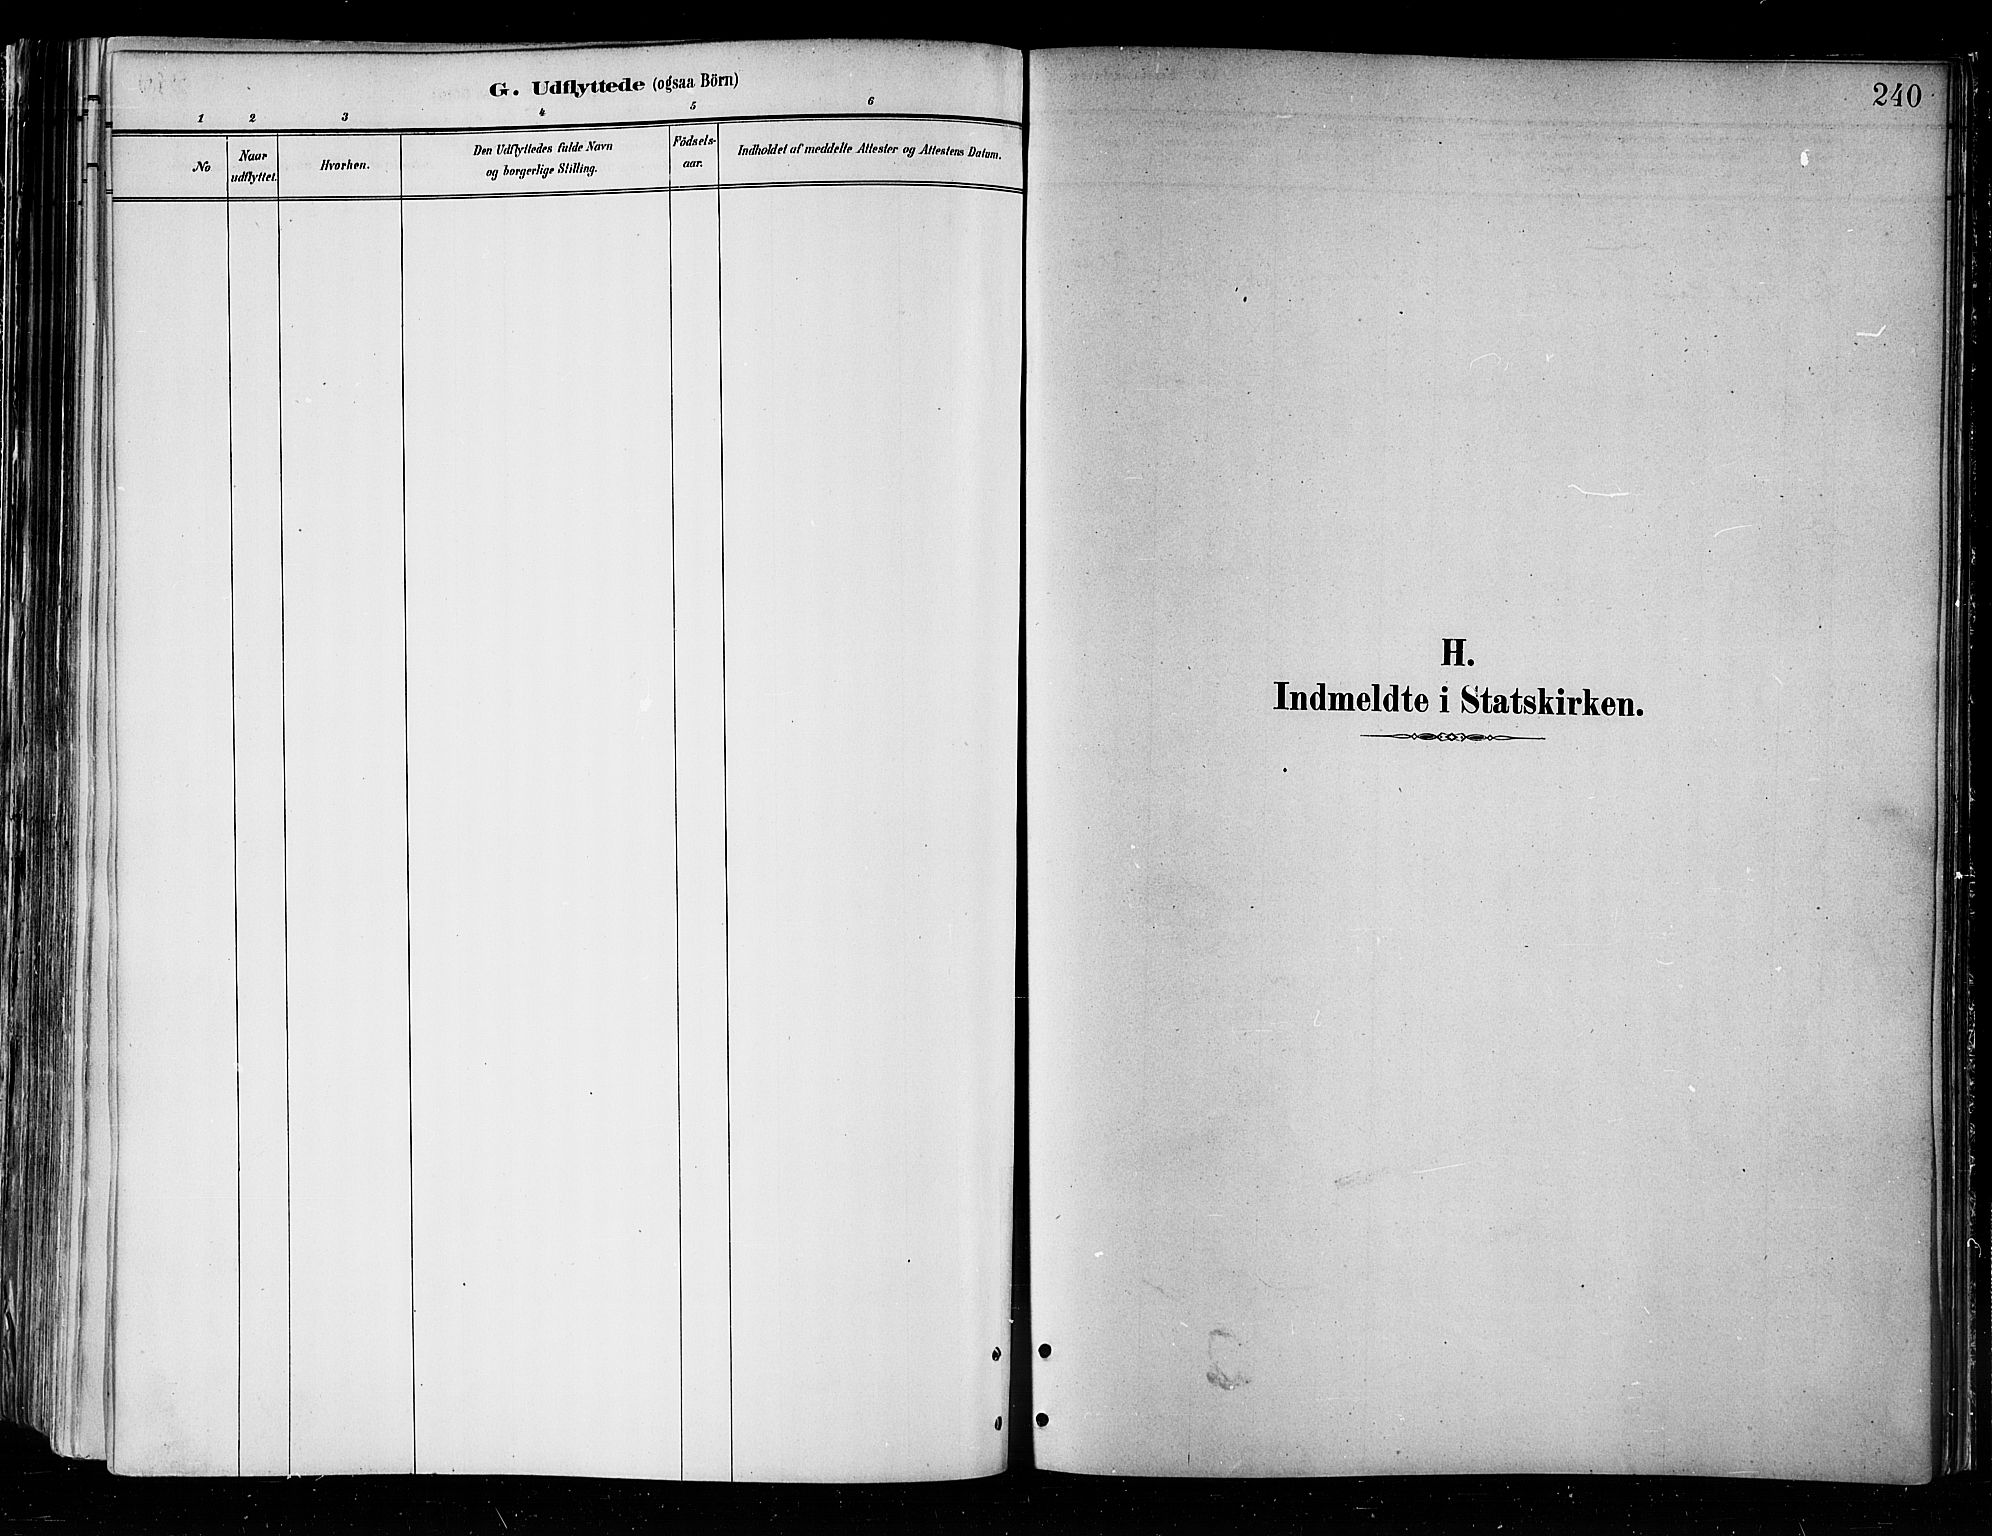 SATØ, Skjervøy sokneprestkontor, H/Ha/Haa/L0010kirke: Ministerialbok nr. 10, 1887-1898, s. 240